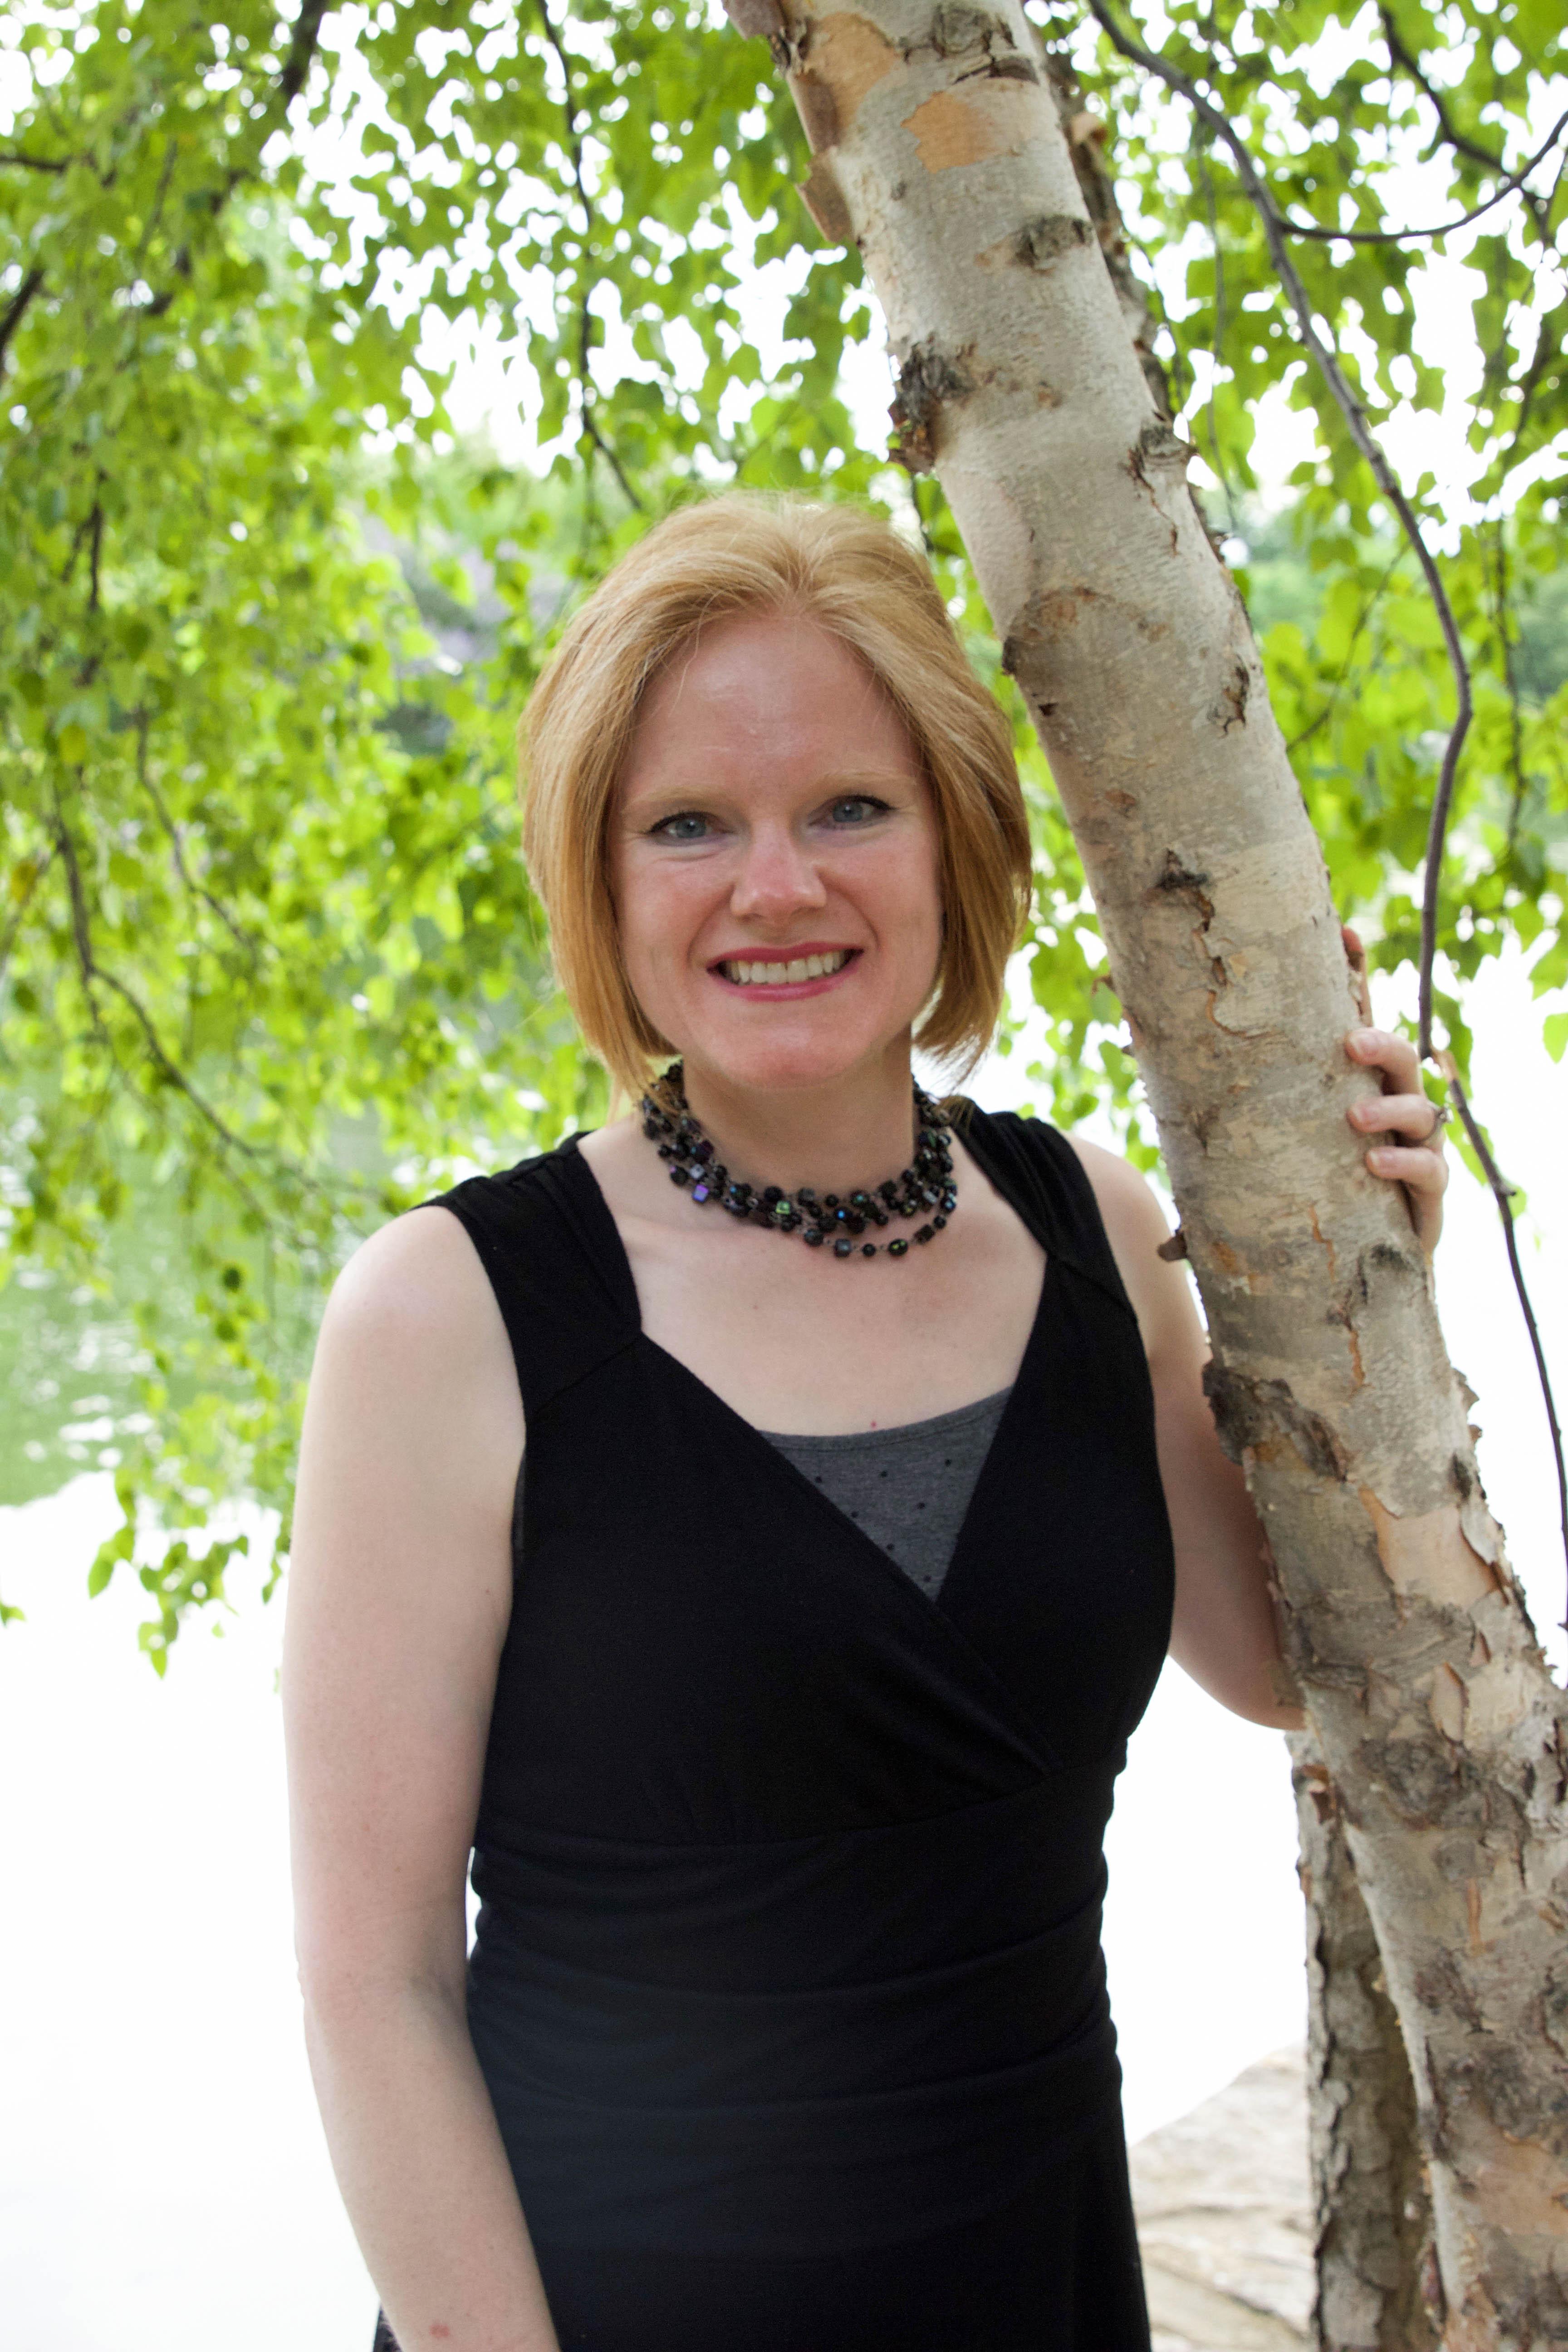 Angela Risher